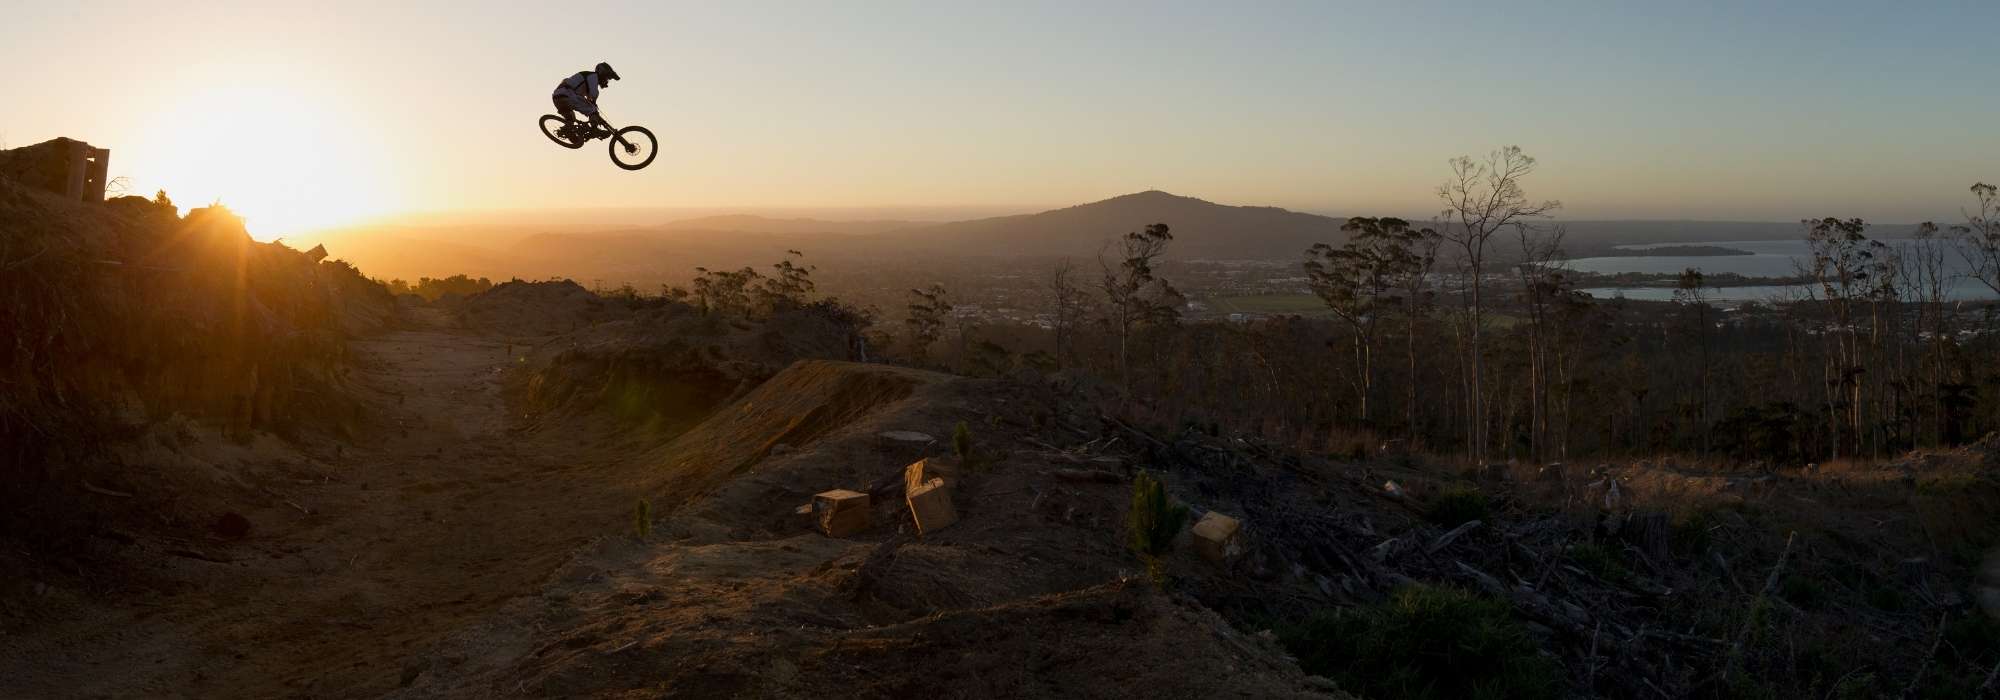 Top tips on mountain biking etiquette